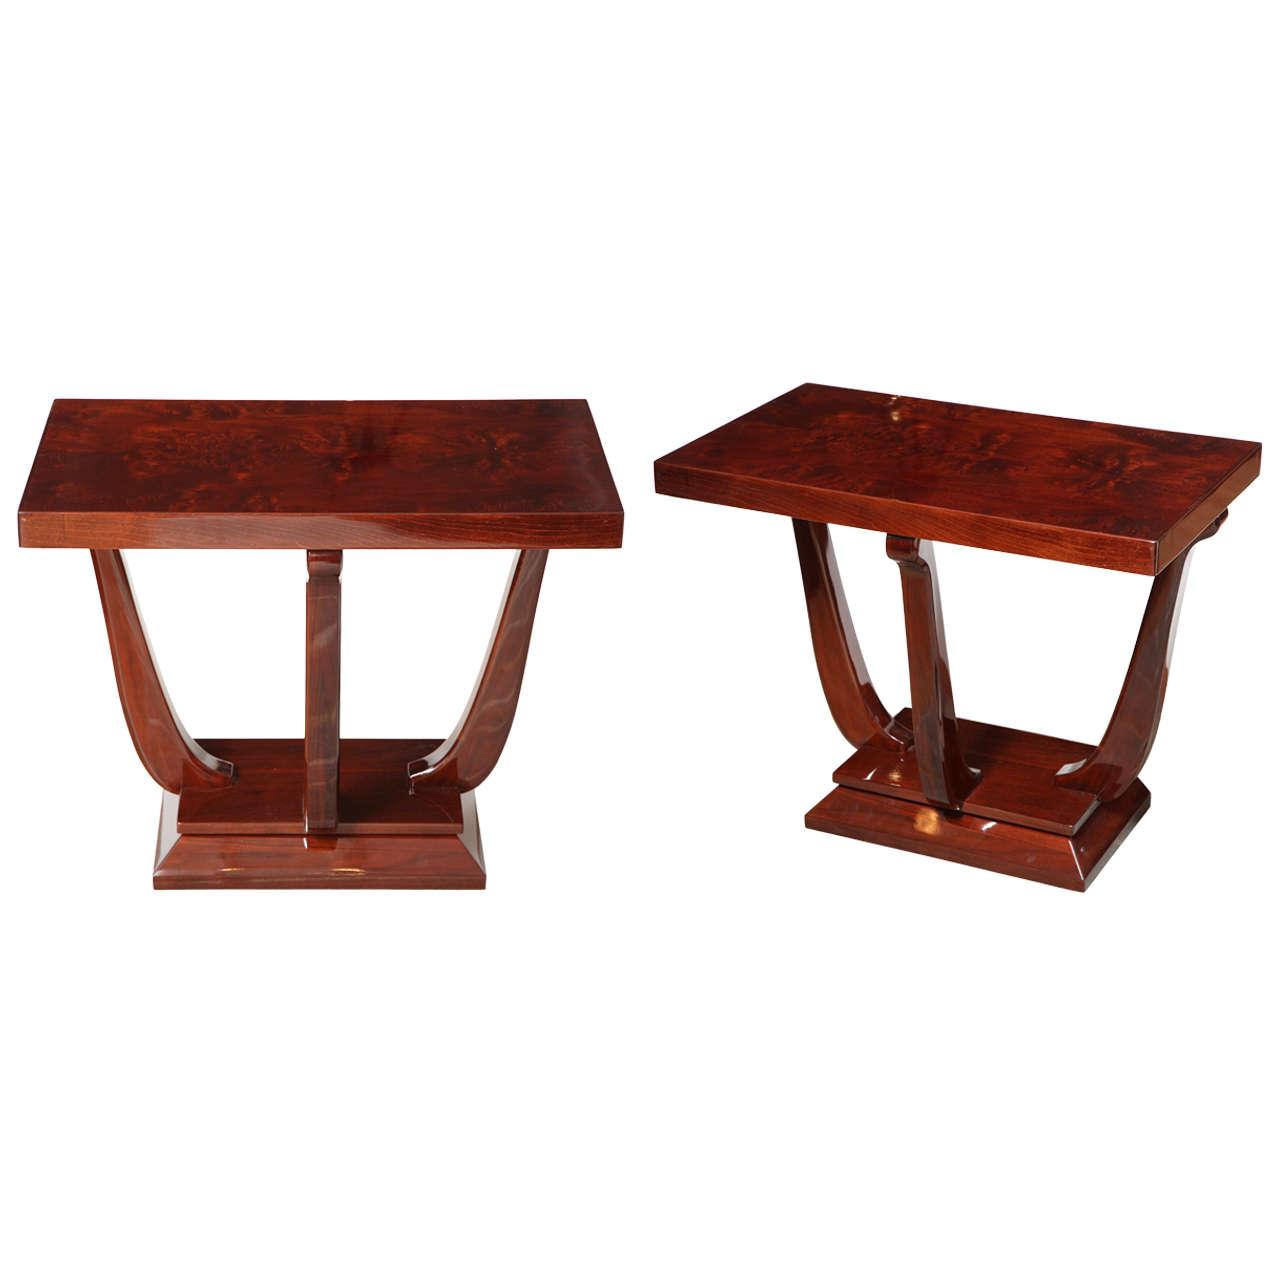 Amazing Art Deco Style Table